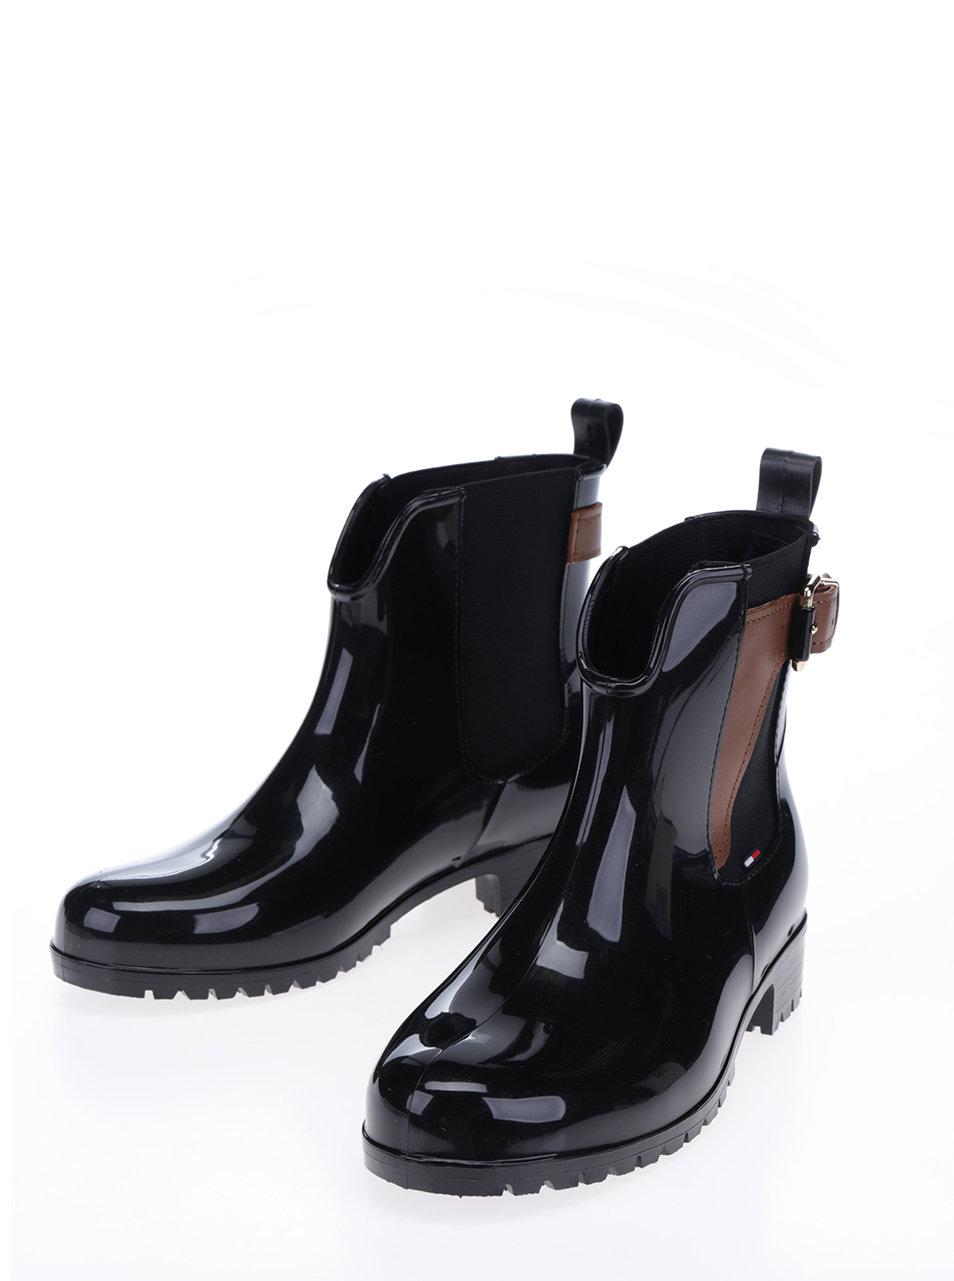 52879998f4 Čierne dámske gumové chelsea topánky s koženými detailmi Tommy Hilfiger  Oxley ...